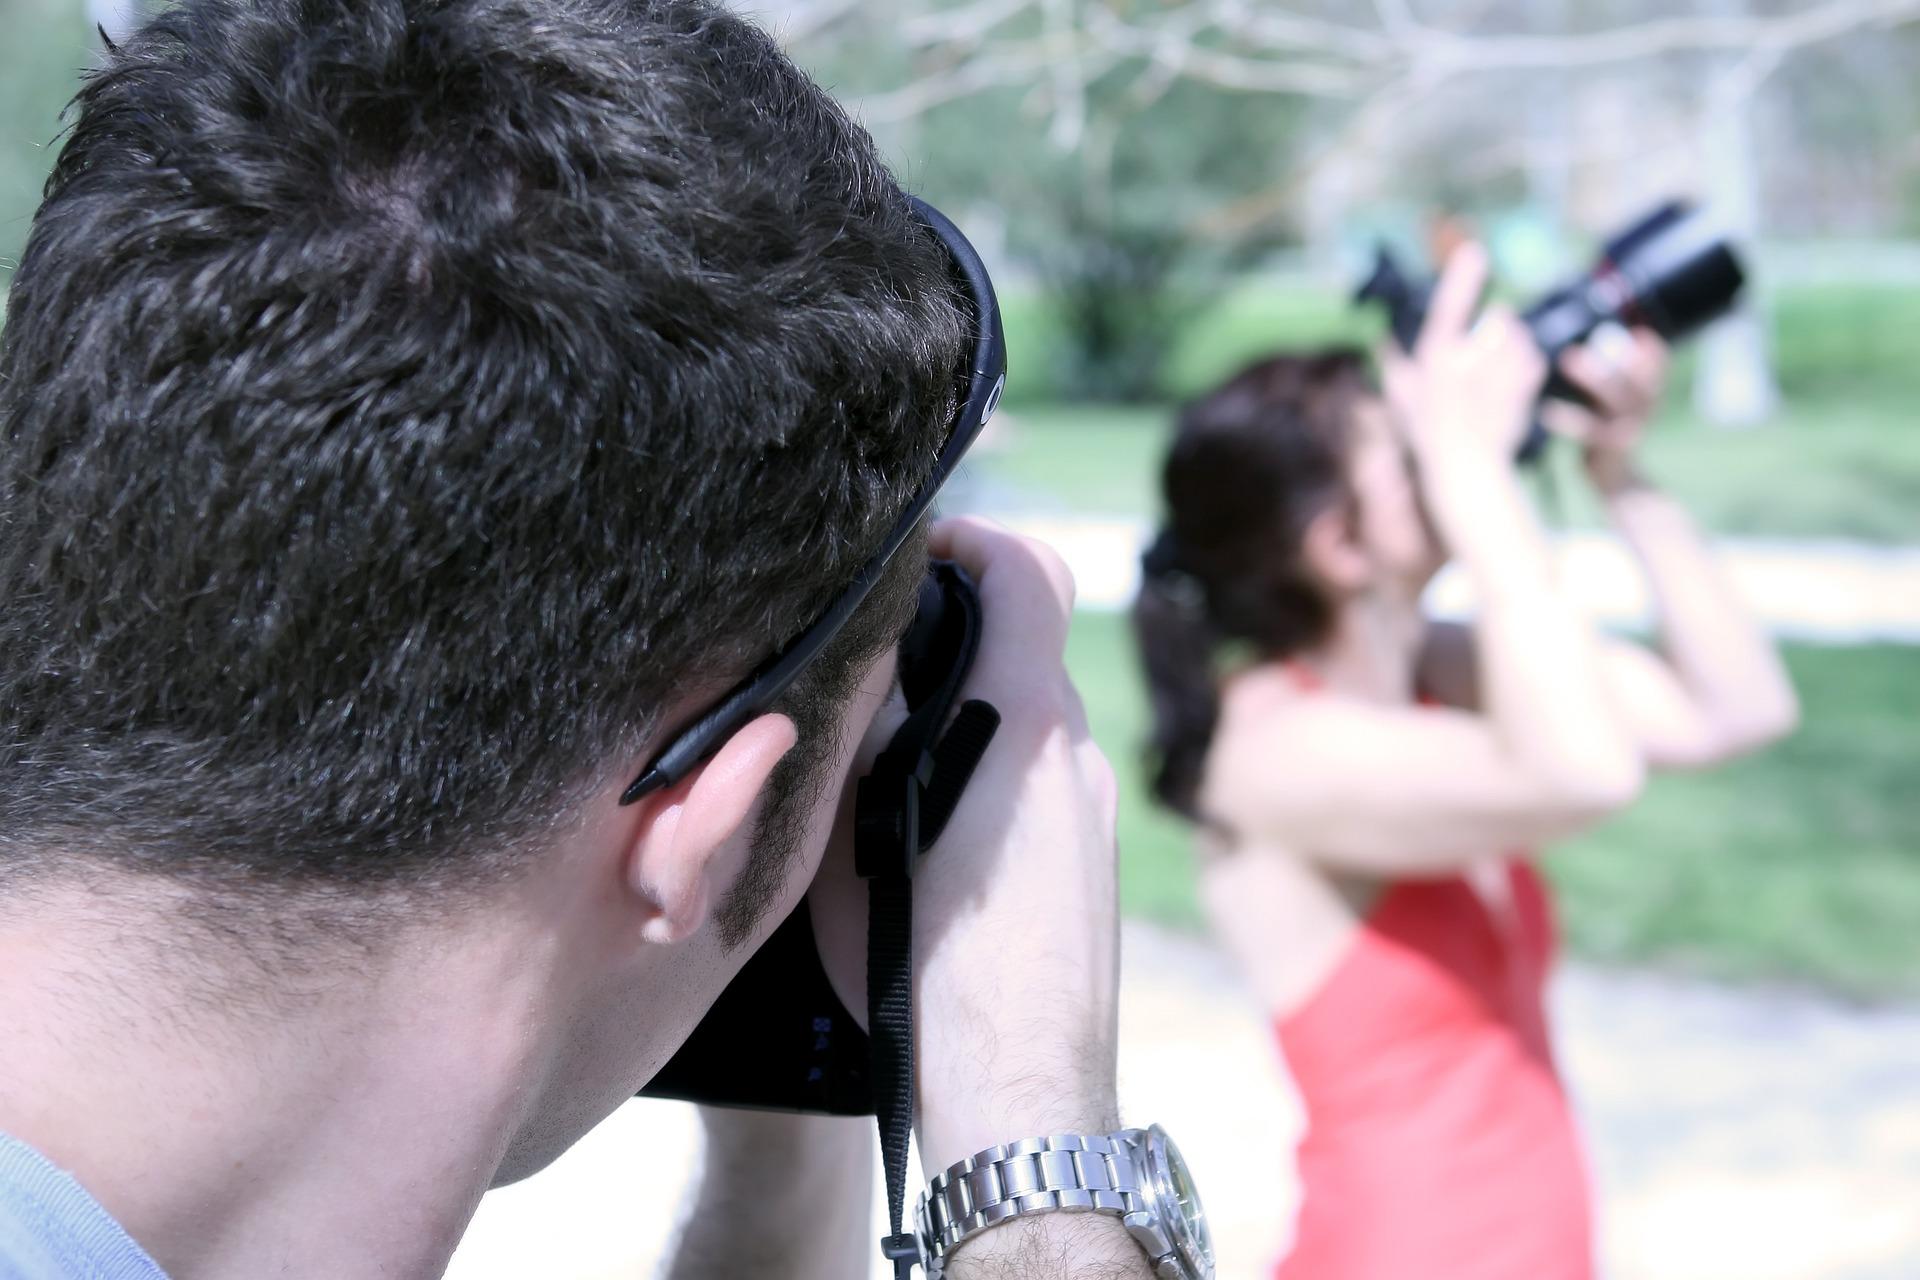 closeup behind photographer taking photo of woman using a DSLR camera